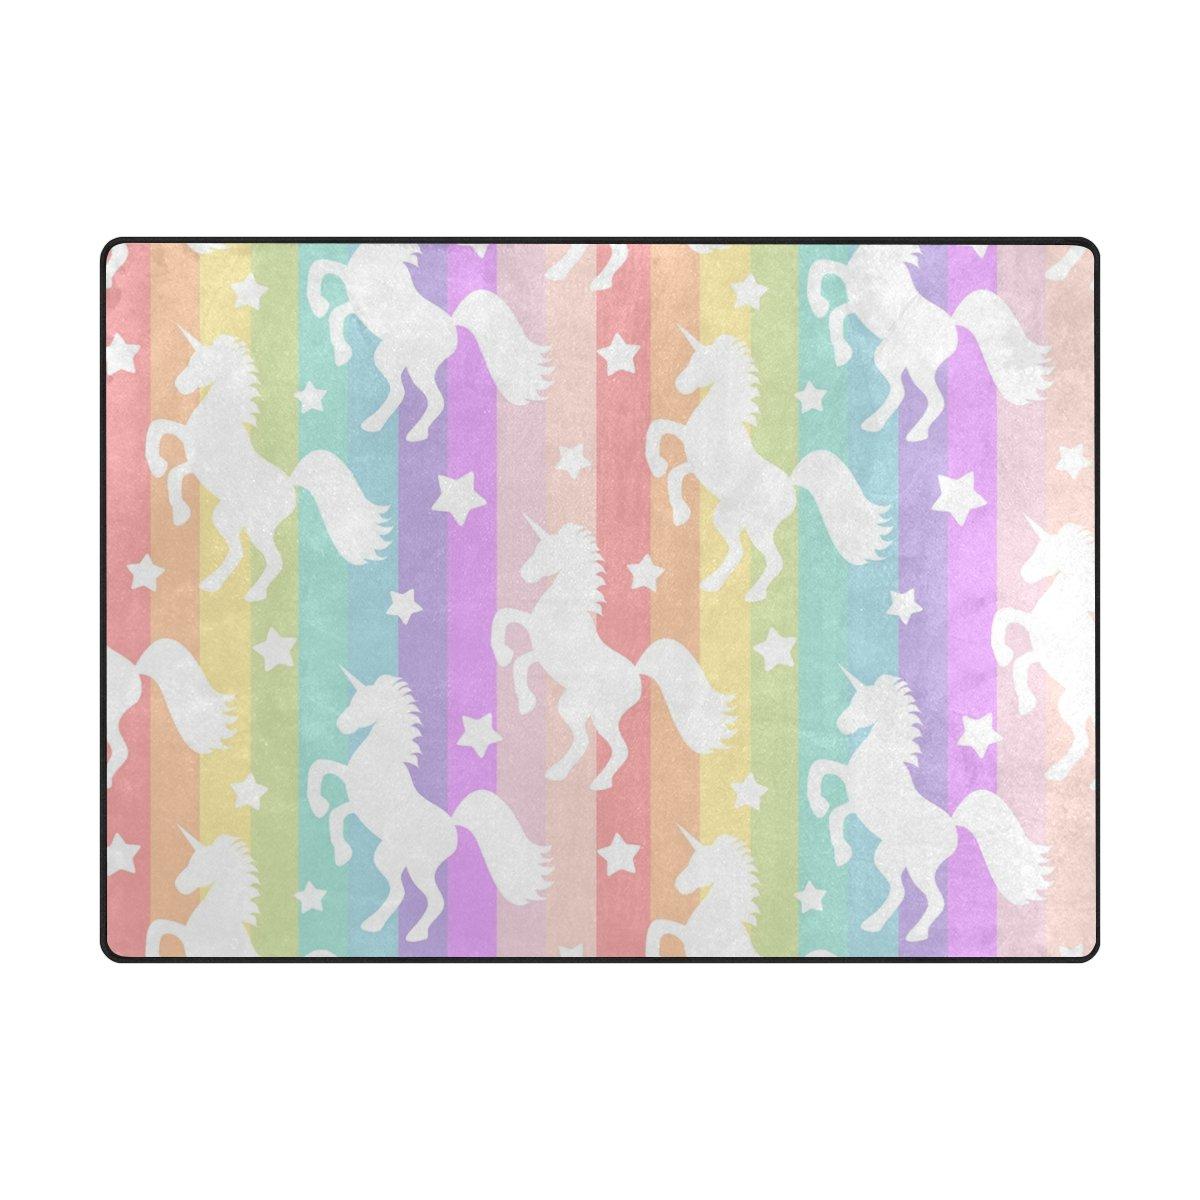 YZGO White Unicorns Stars on Rainbow Colorful Rug, Kids Children Area Rugs Non-Slip Floor Mat Resting Area Doormats